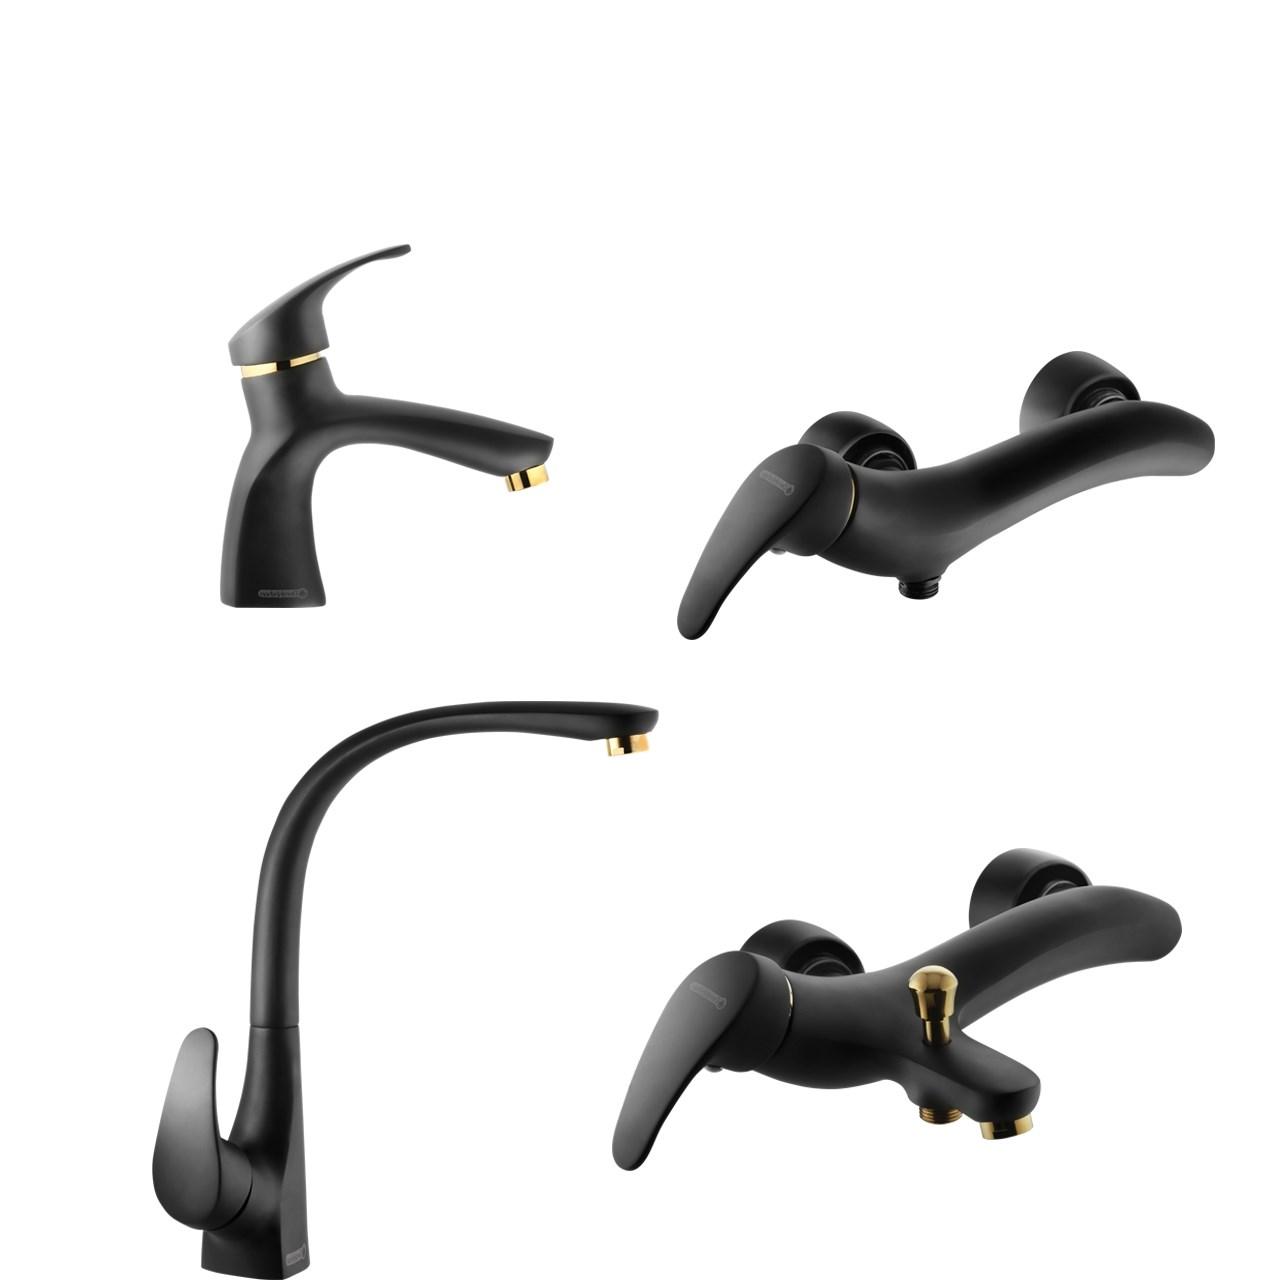 "<span style=""font-family:tahoma;"">ست شیرآلات درخشان مدل بیوتی بلک Derakhshan Black Beauty Set Faucets</span>"